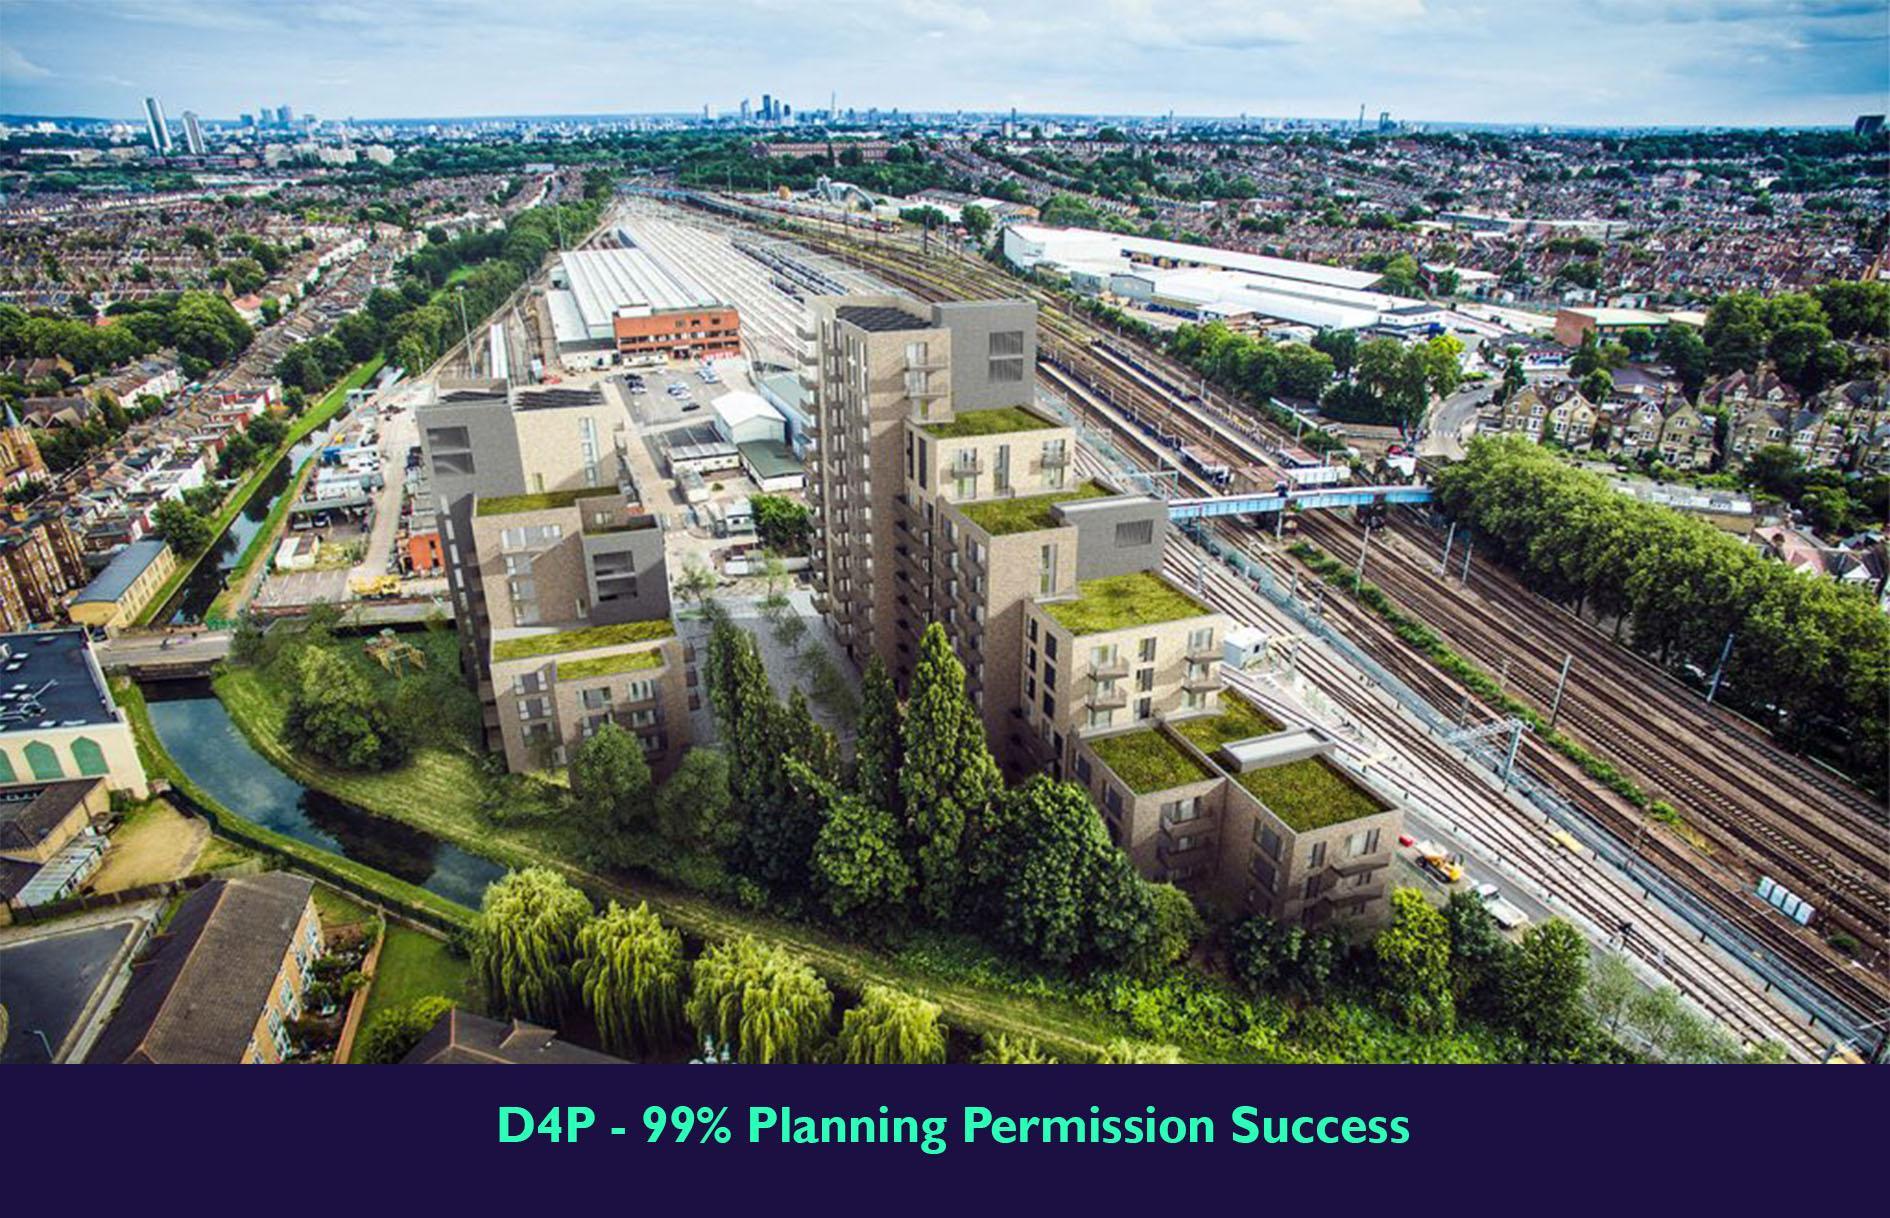 D4P Landscape Architects in London